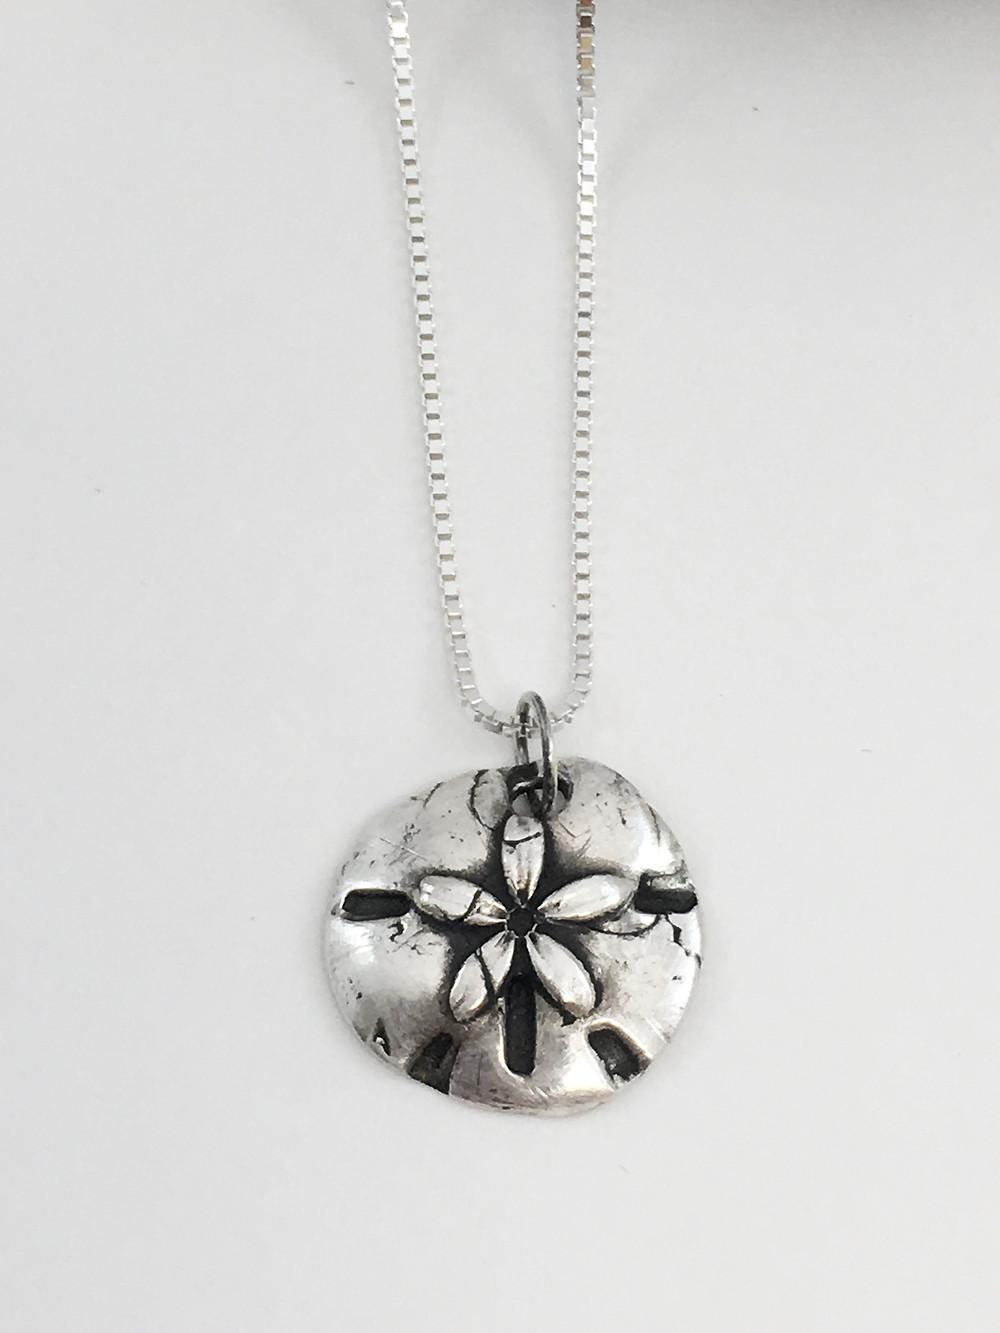 silver sand dollar pendant, PMC pendant